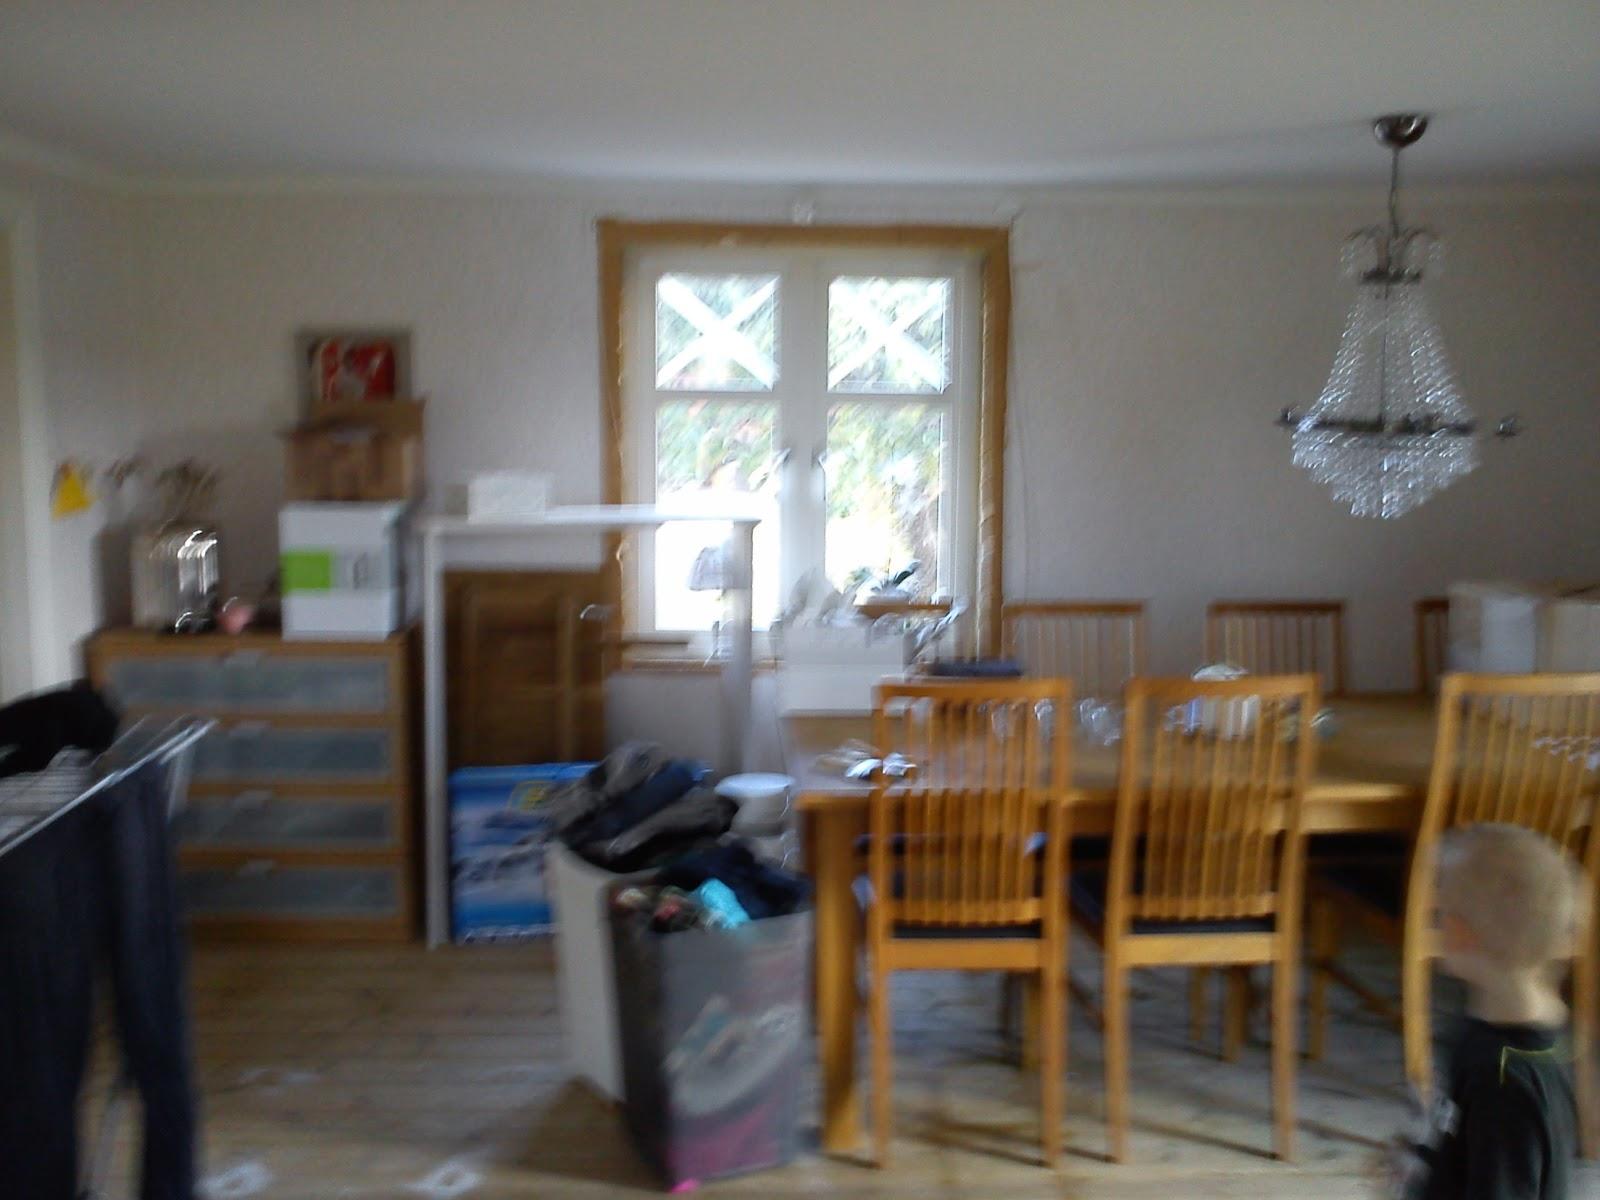 Ankis liv på landet: en liten titt på vardagsrummet...........